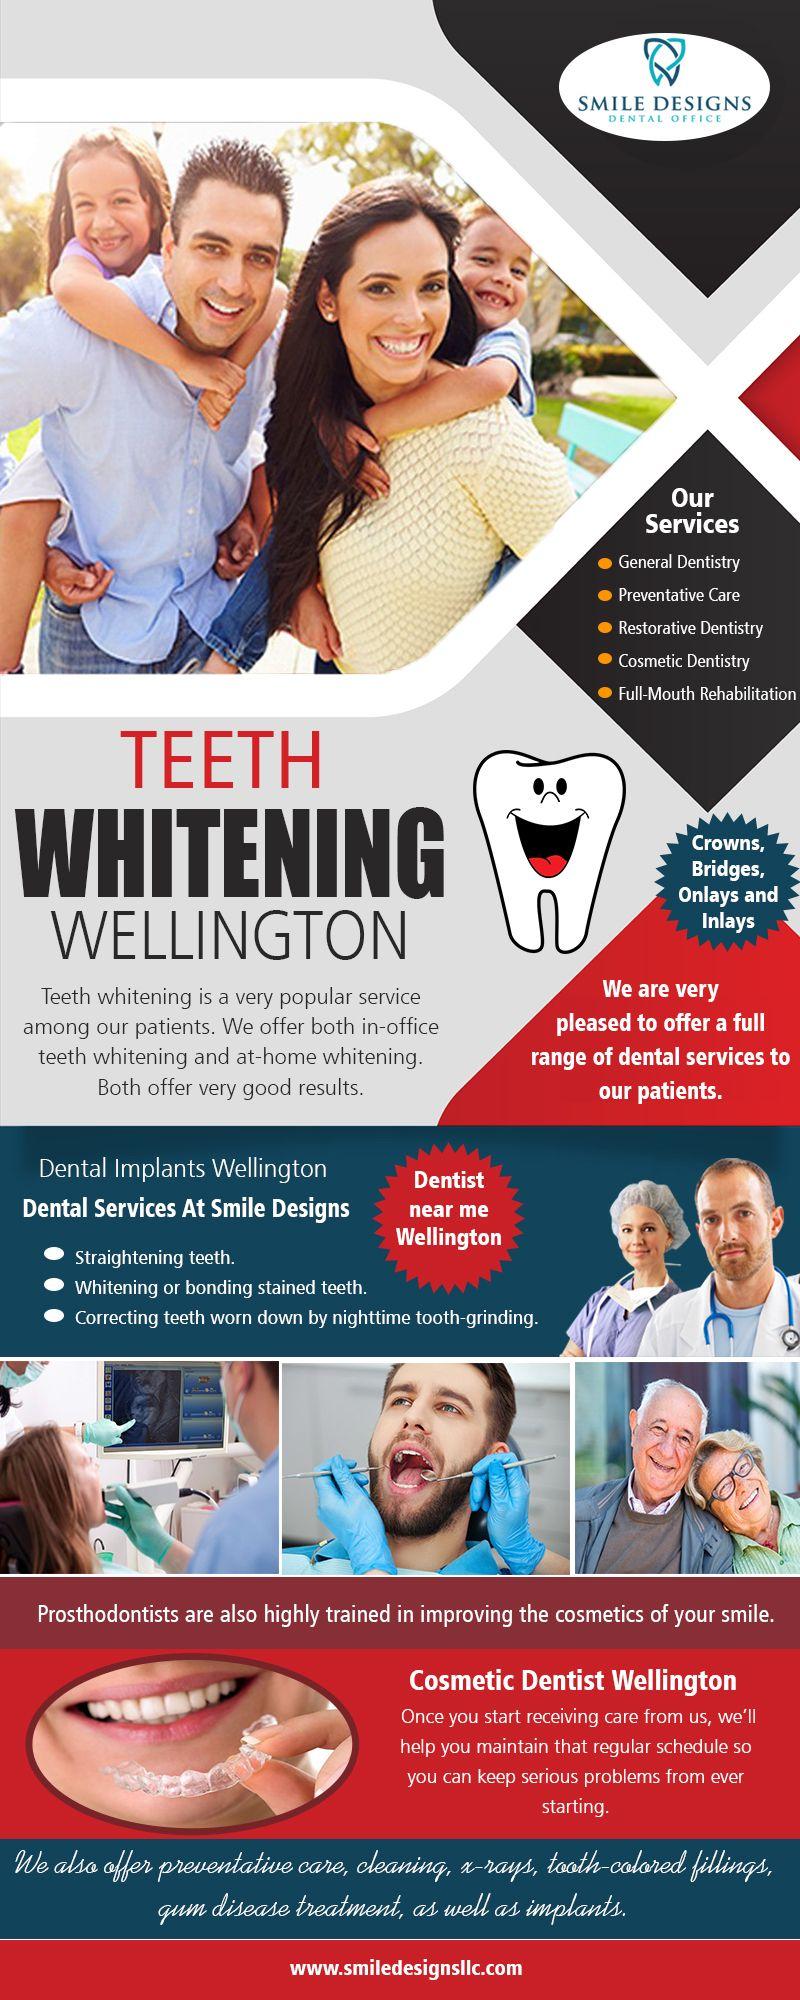 Pin on Dentist near me Wellington